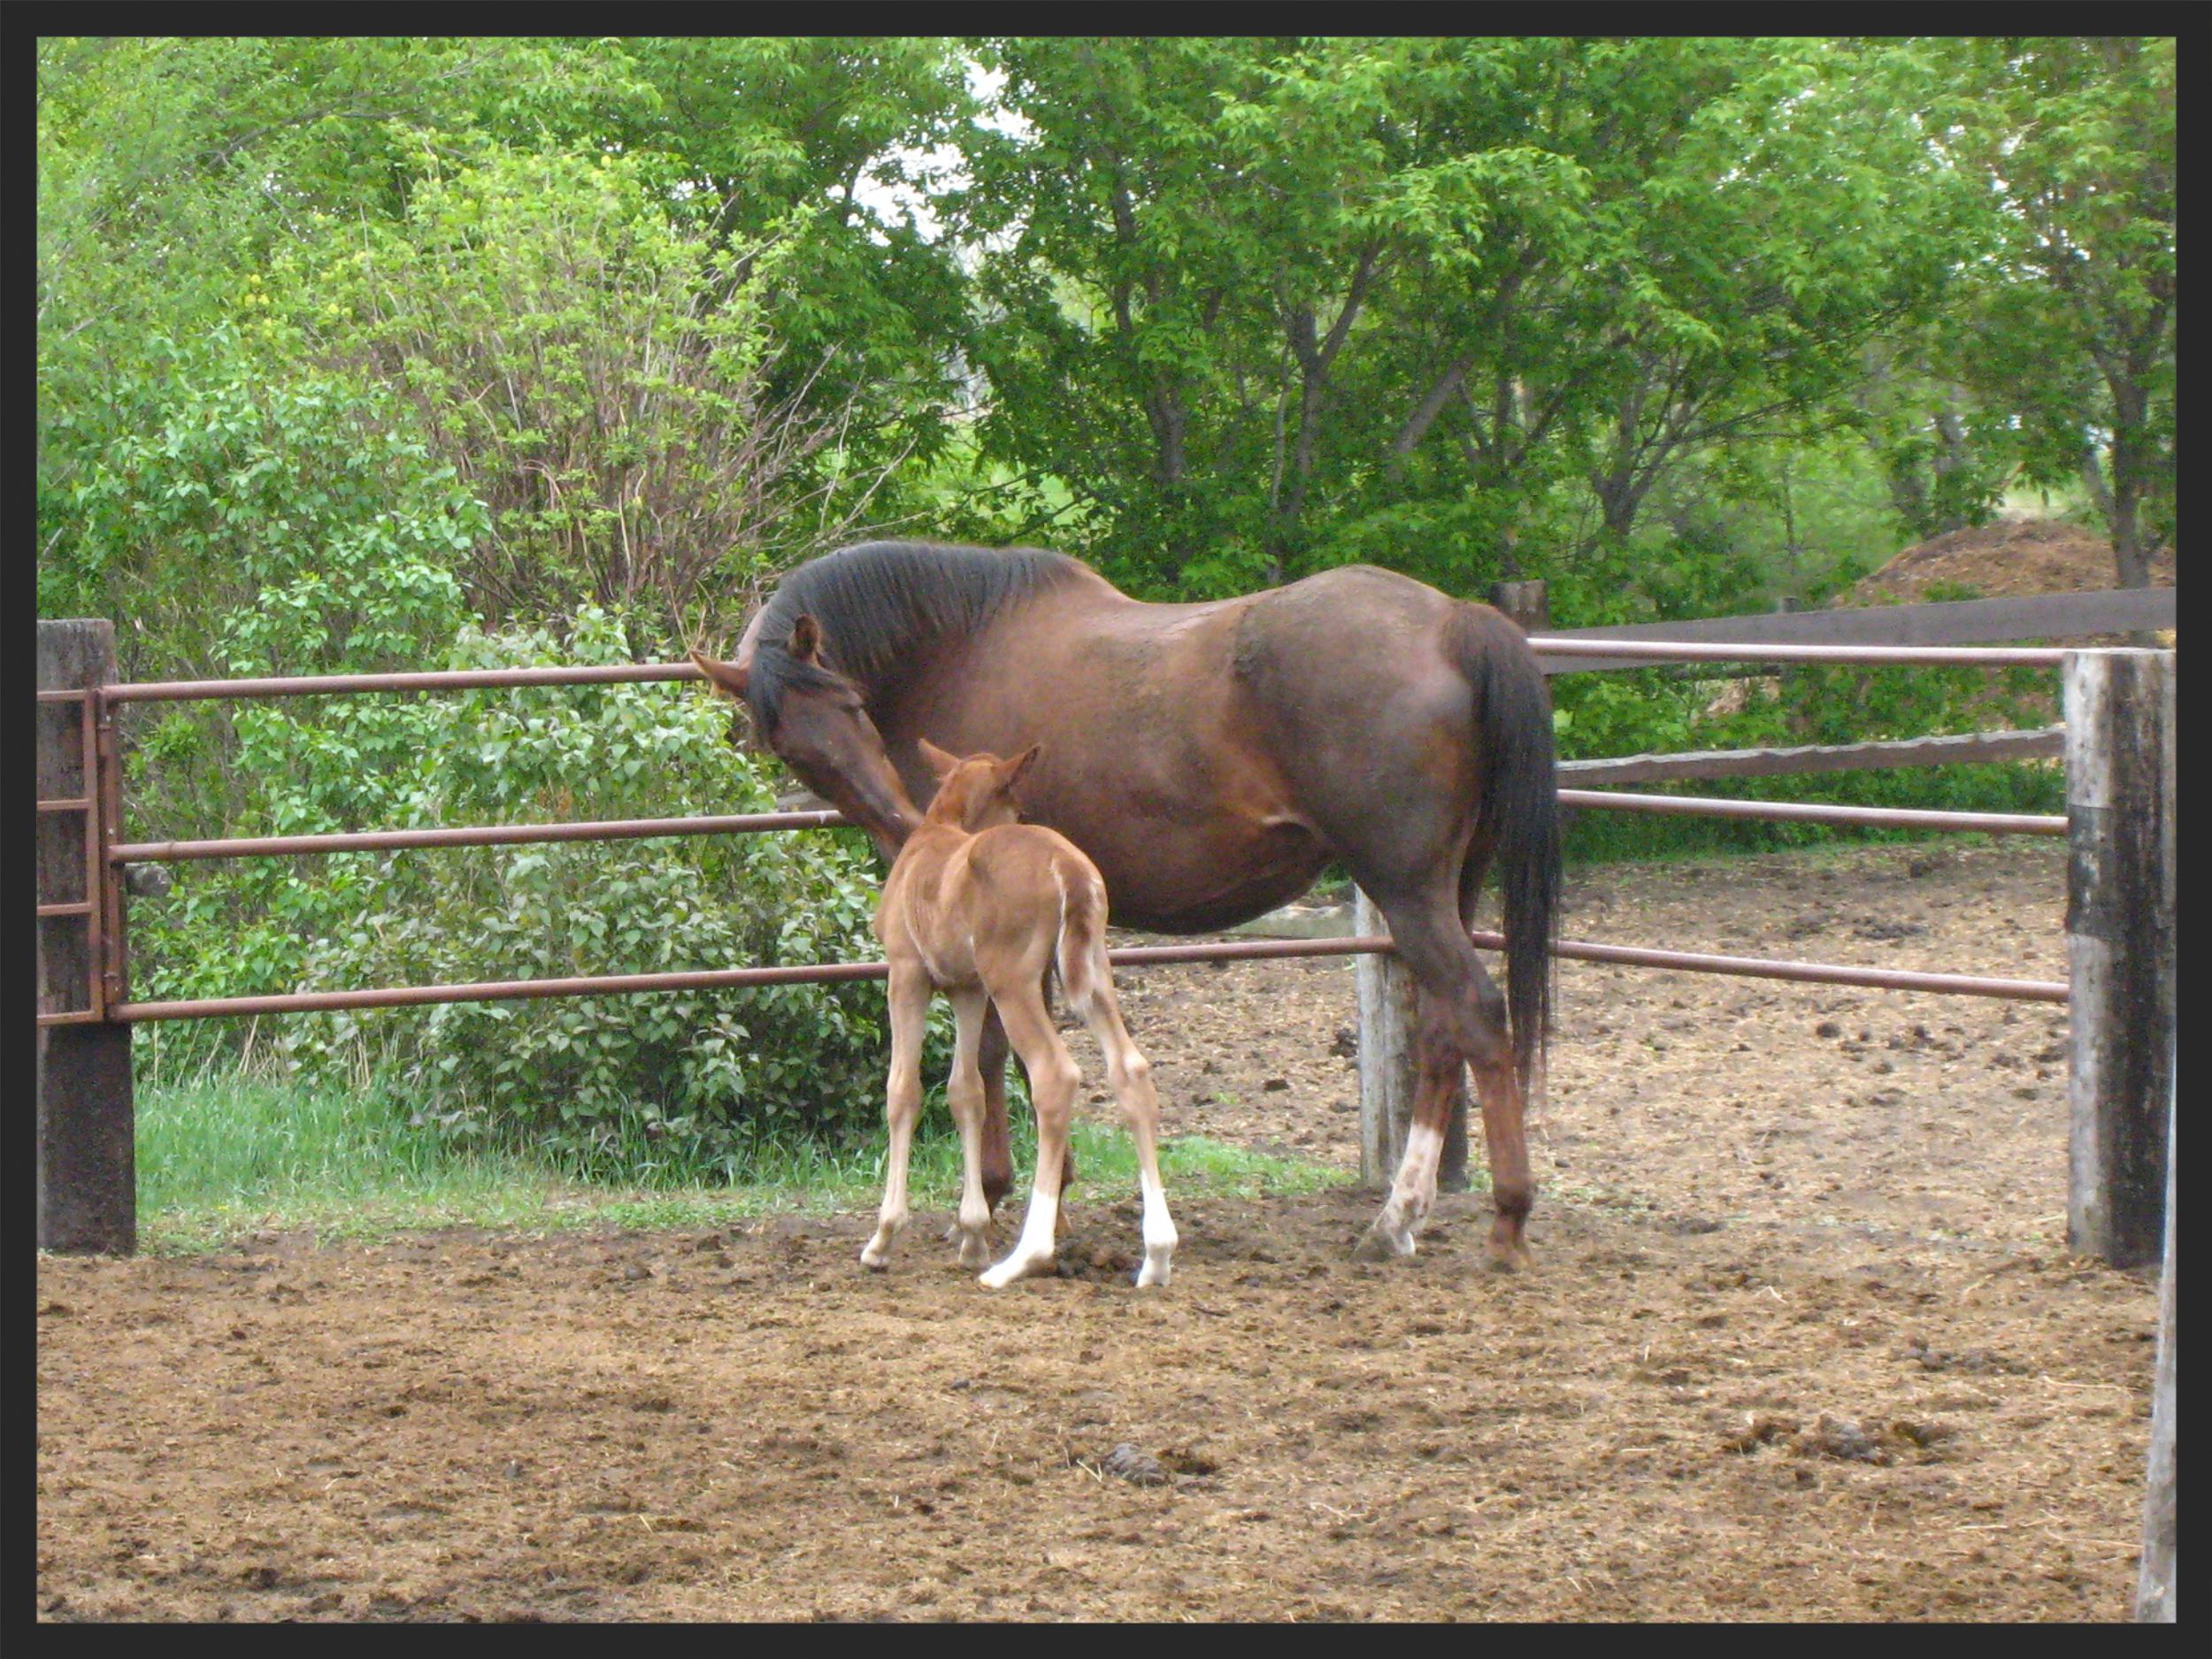 foal mare horse equine vet veterinarian doctor Cochrane Calgary Alberta